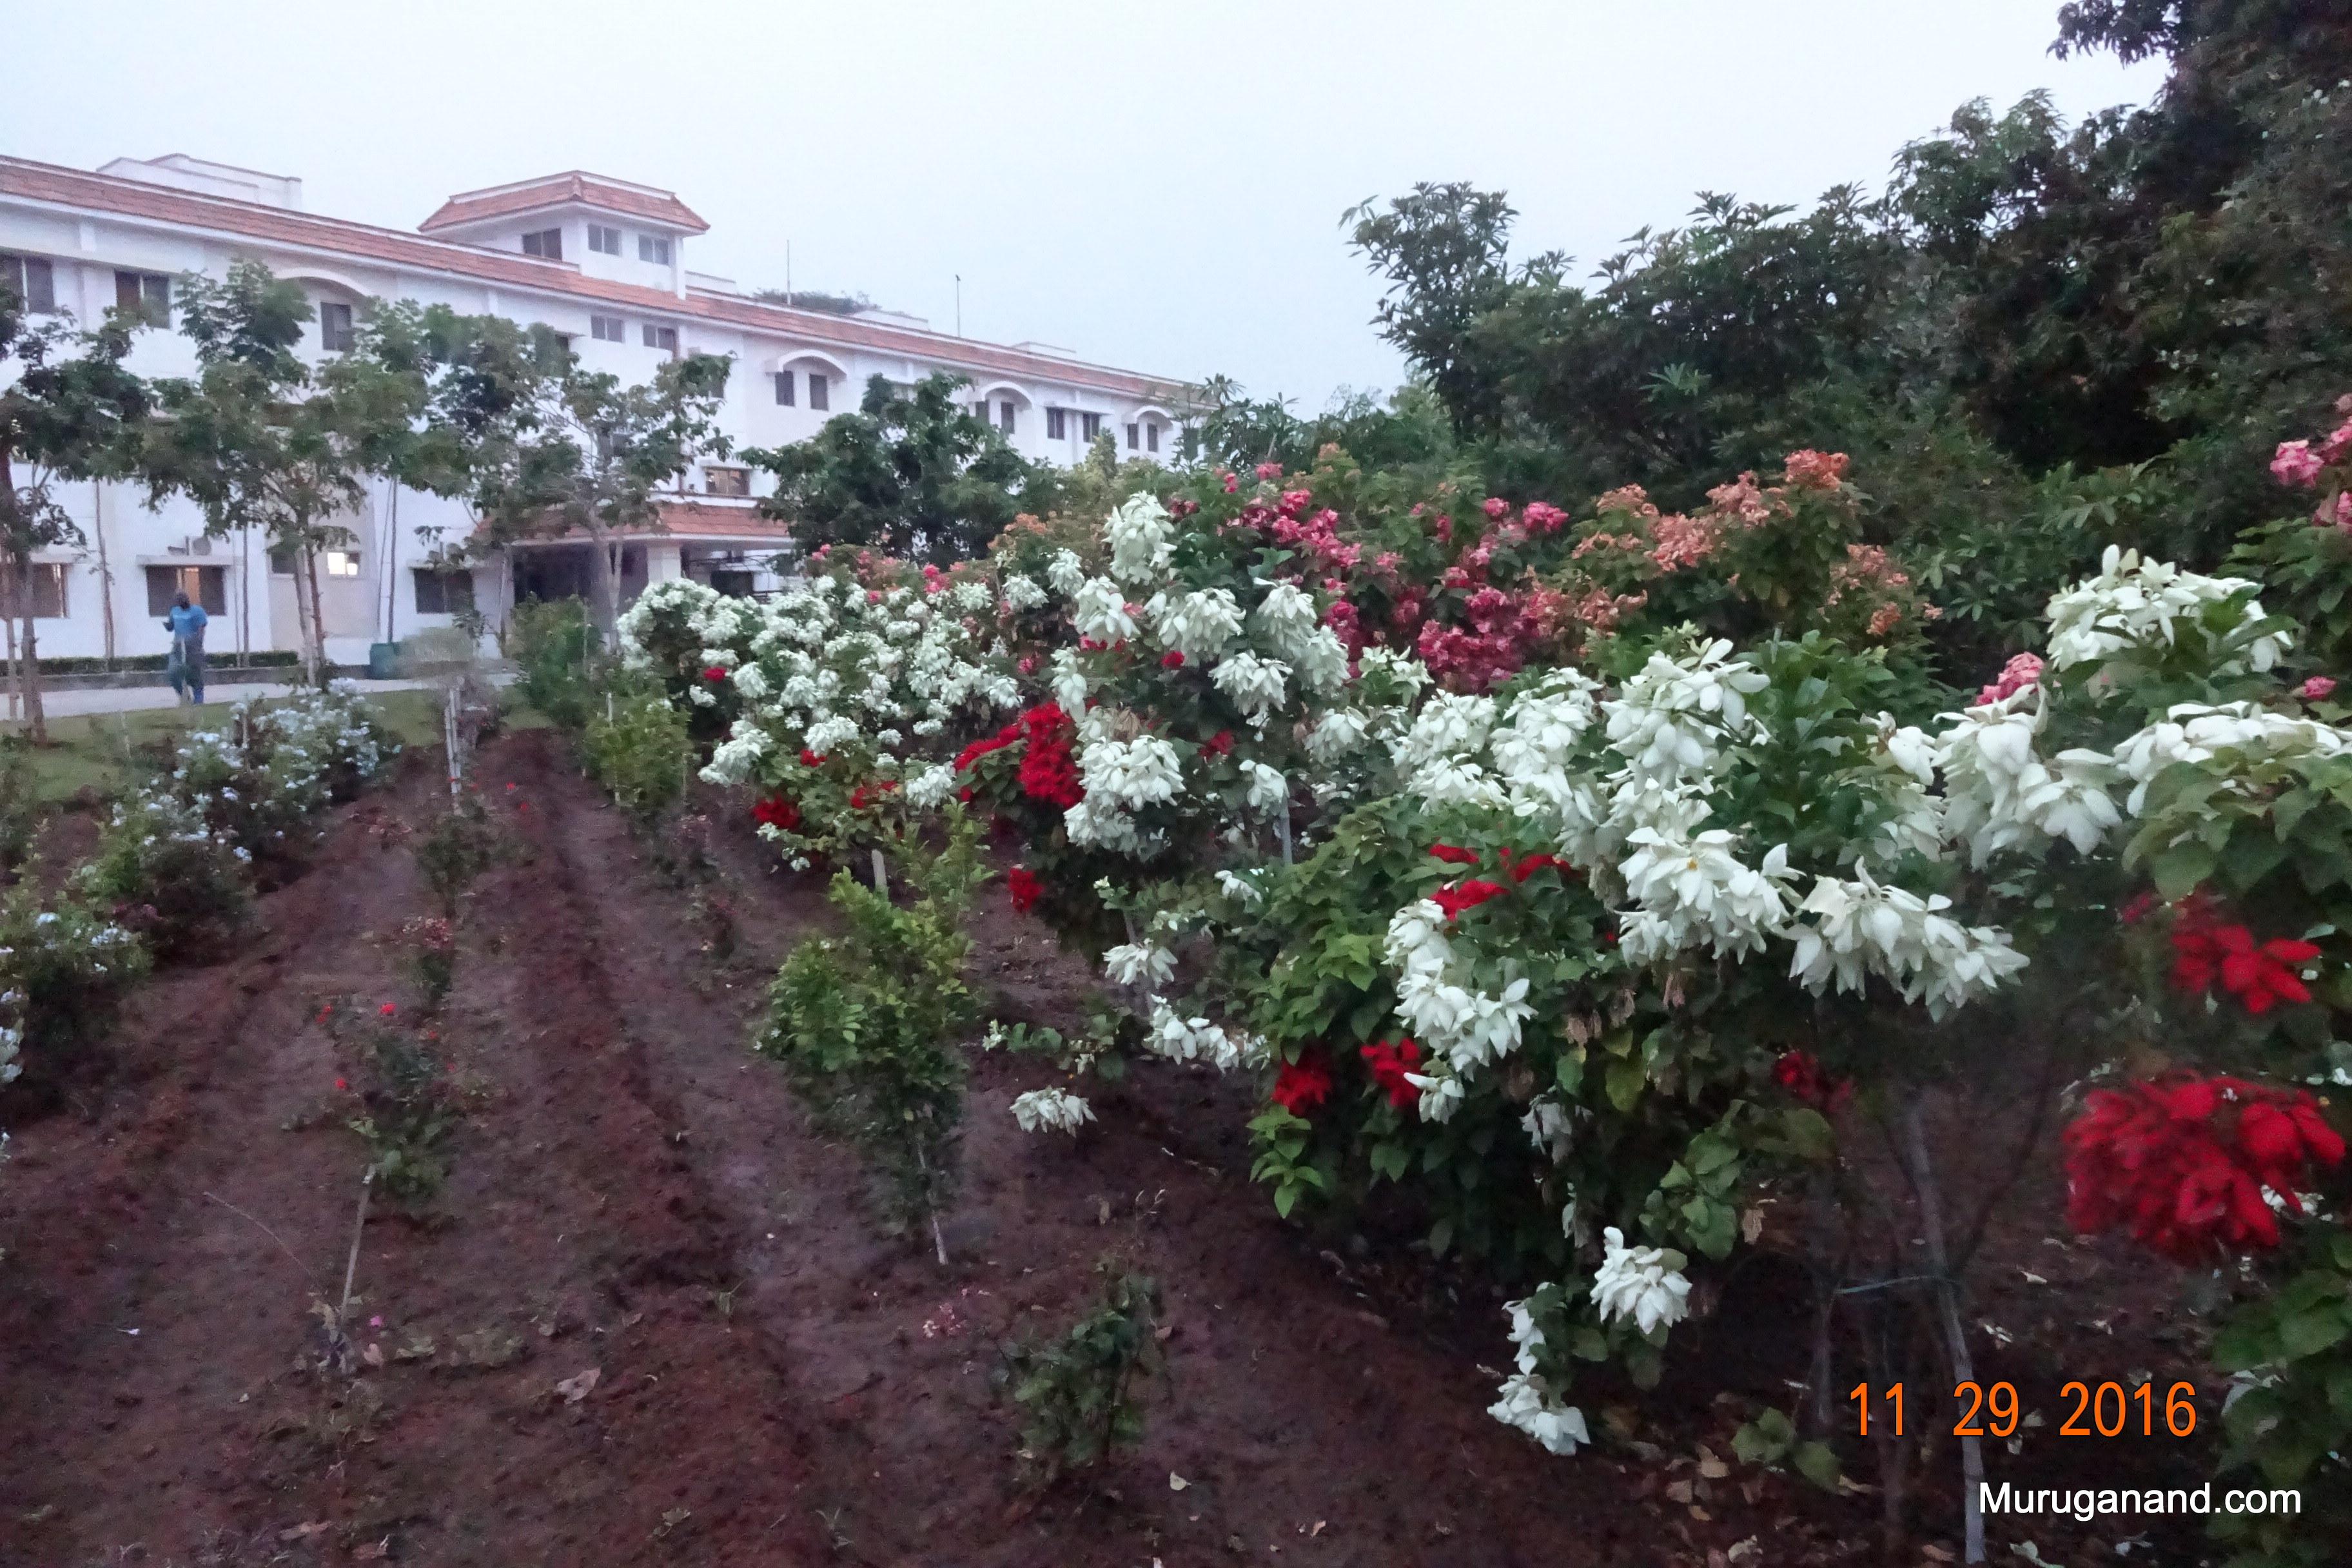 Flower garden has various colorful plants.